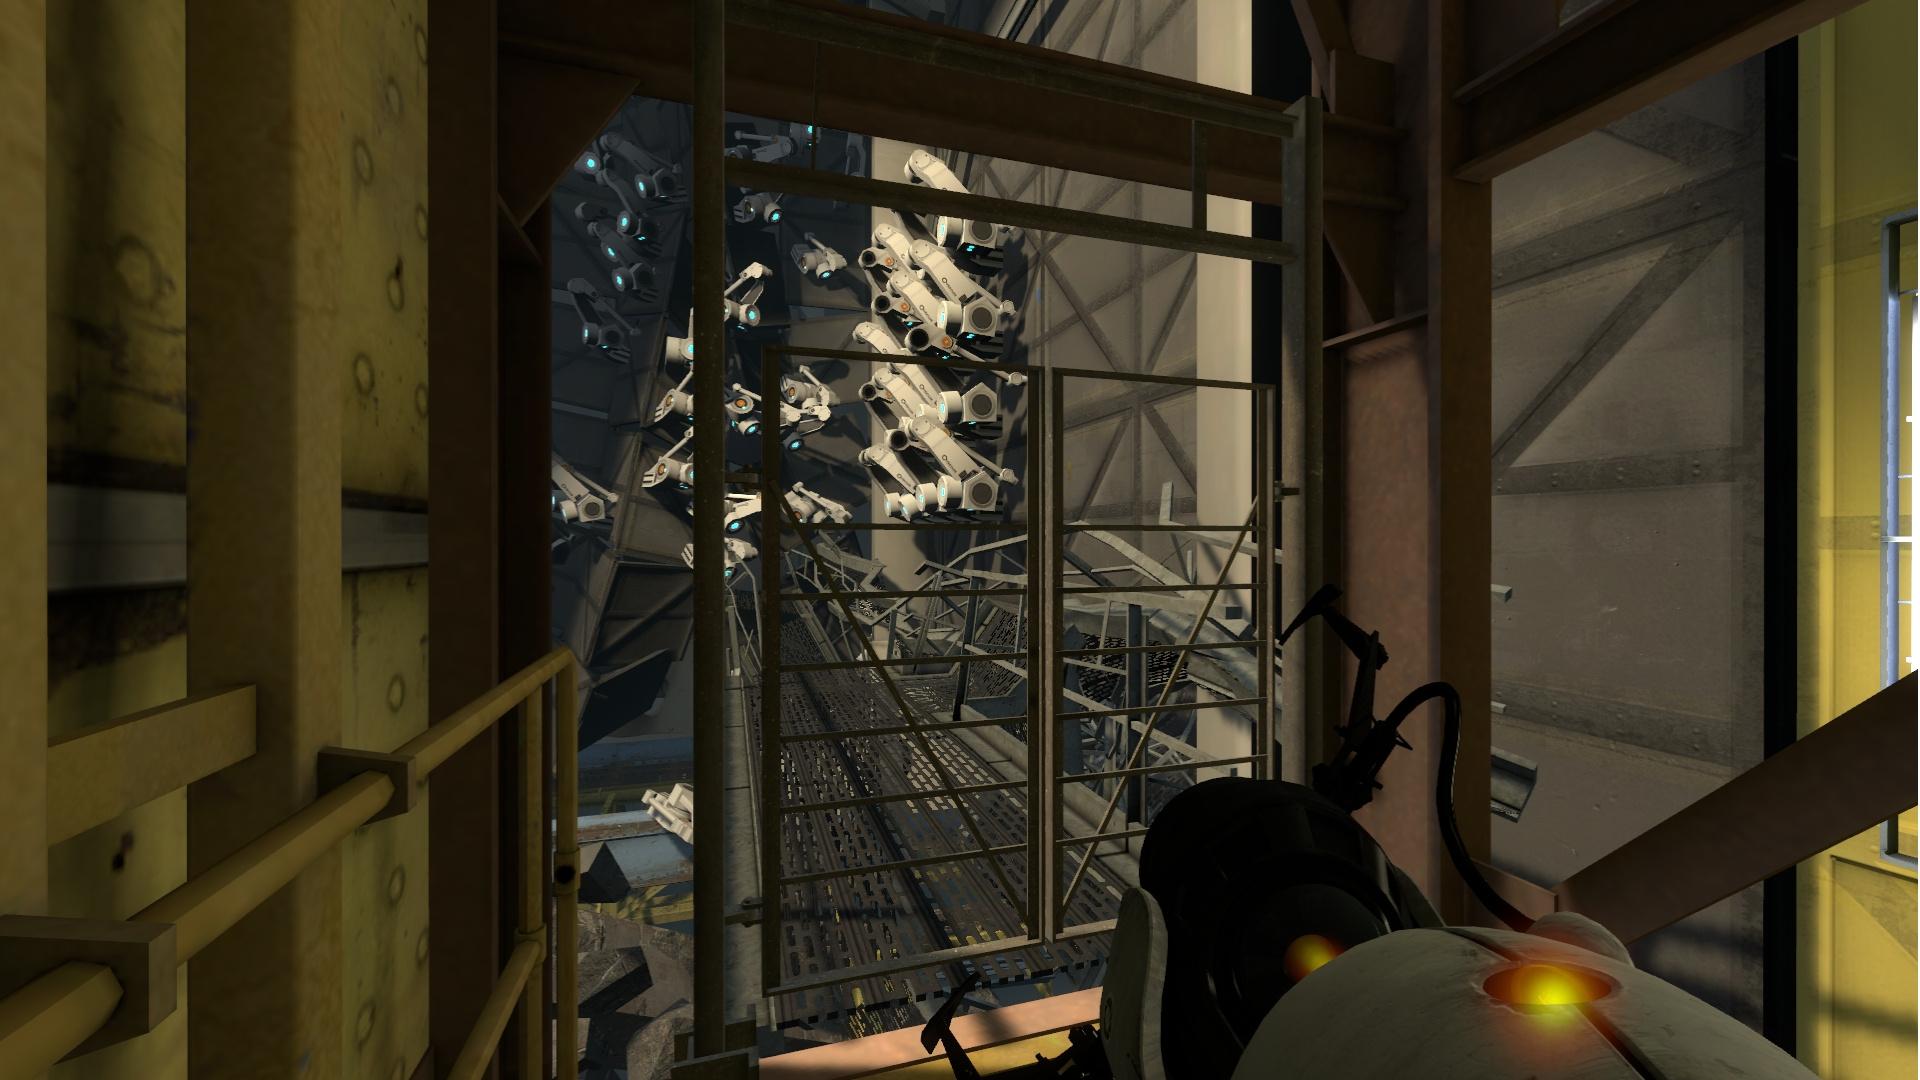 Portal 2 Ps3 Playstation 3 News Reviews Trailer